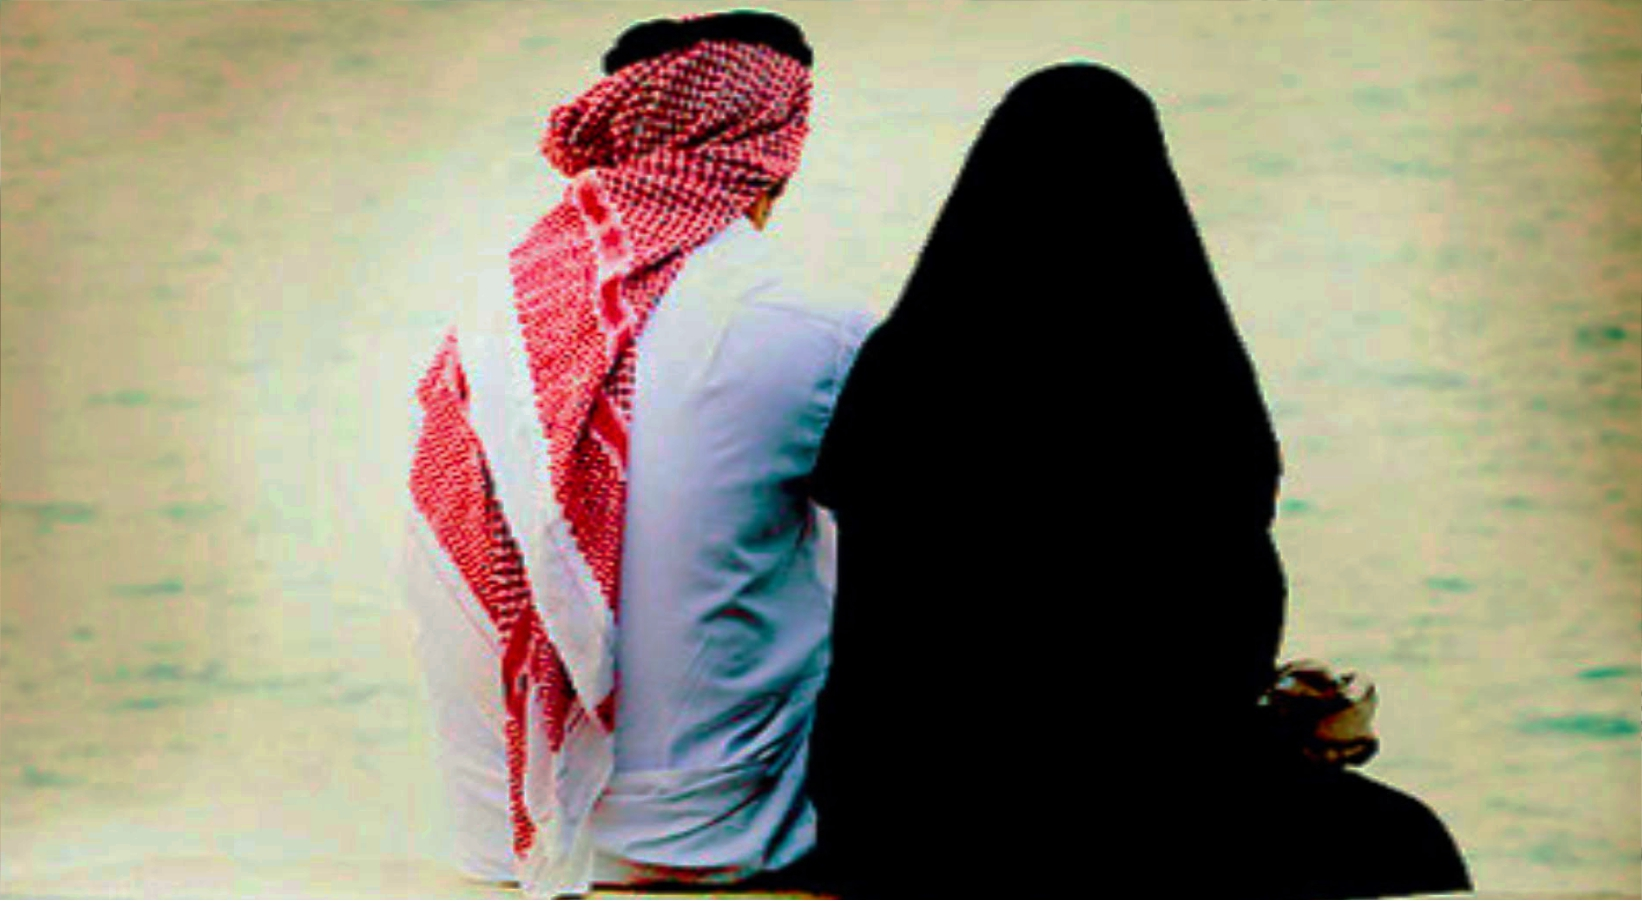 arrisalahnet Istri Shalihah pendukung Dakwah